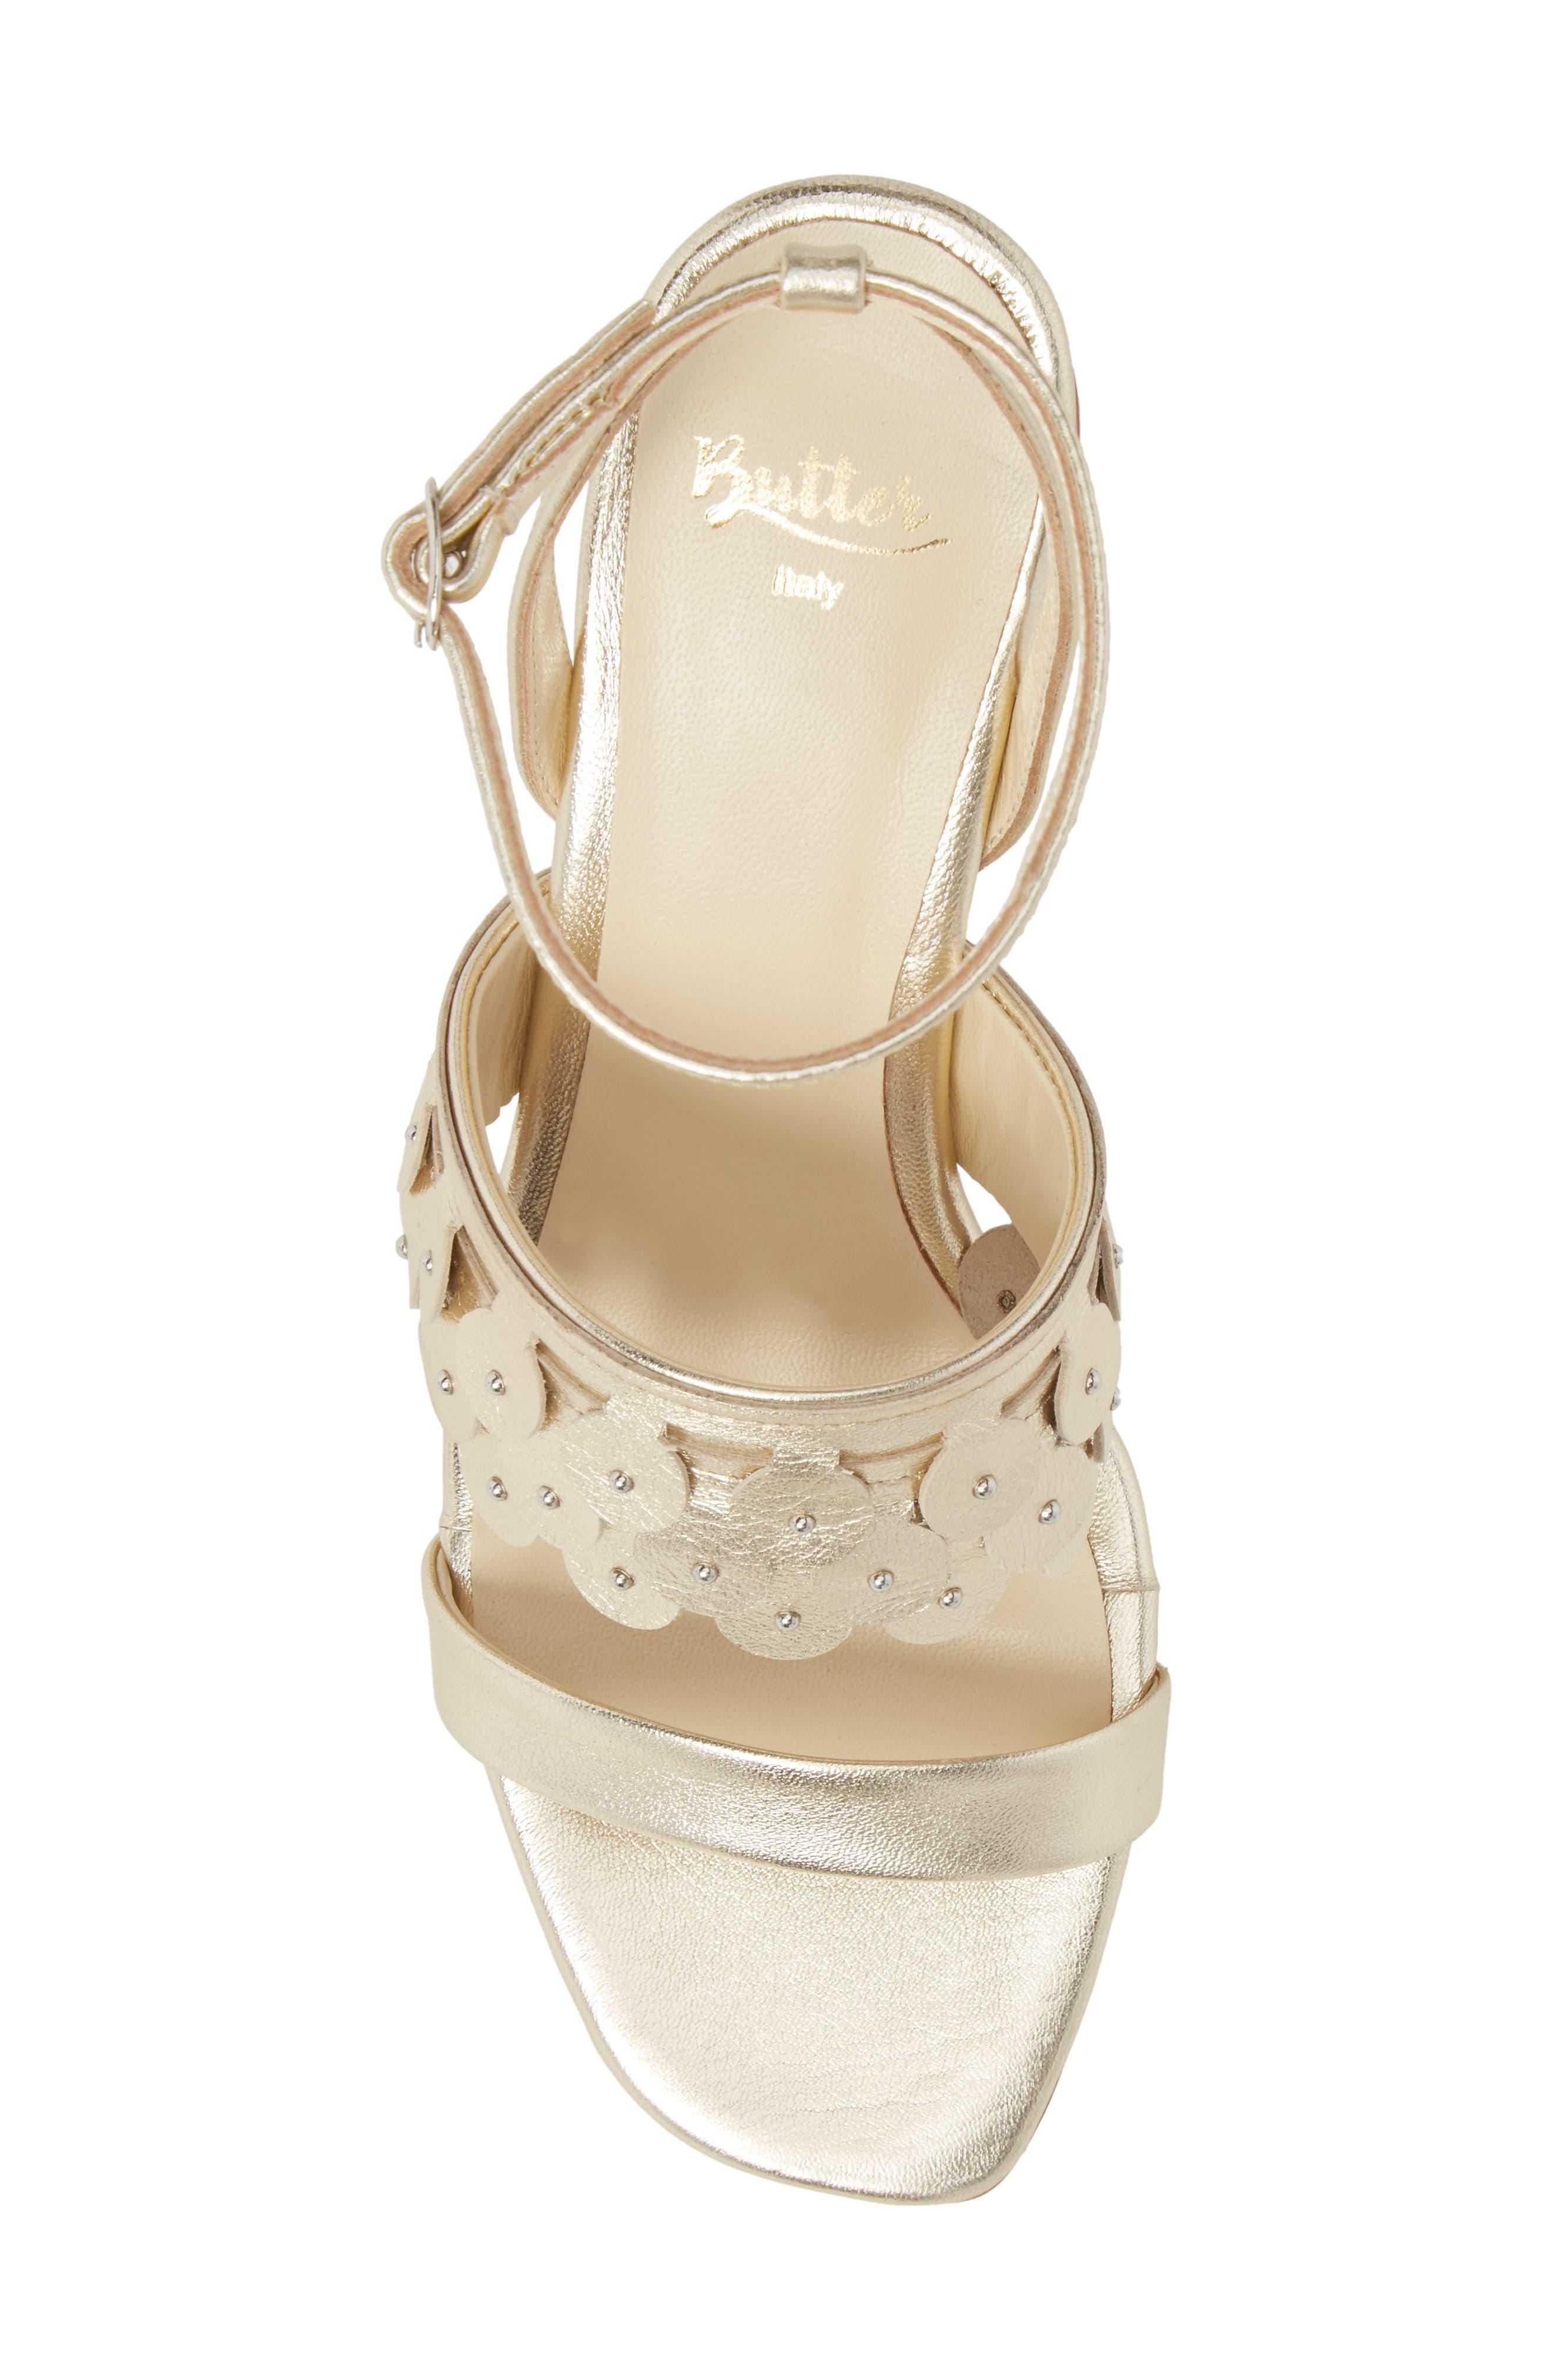 Butter Finley Studded Ankle Strap Sandal,                             Alternate thumbnail 5, color,                             Platino Napa